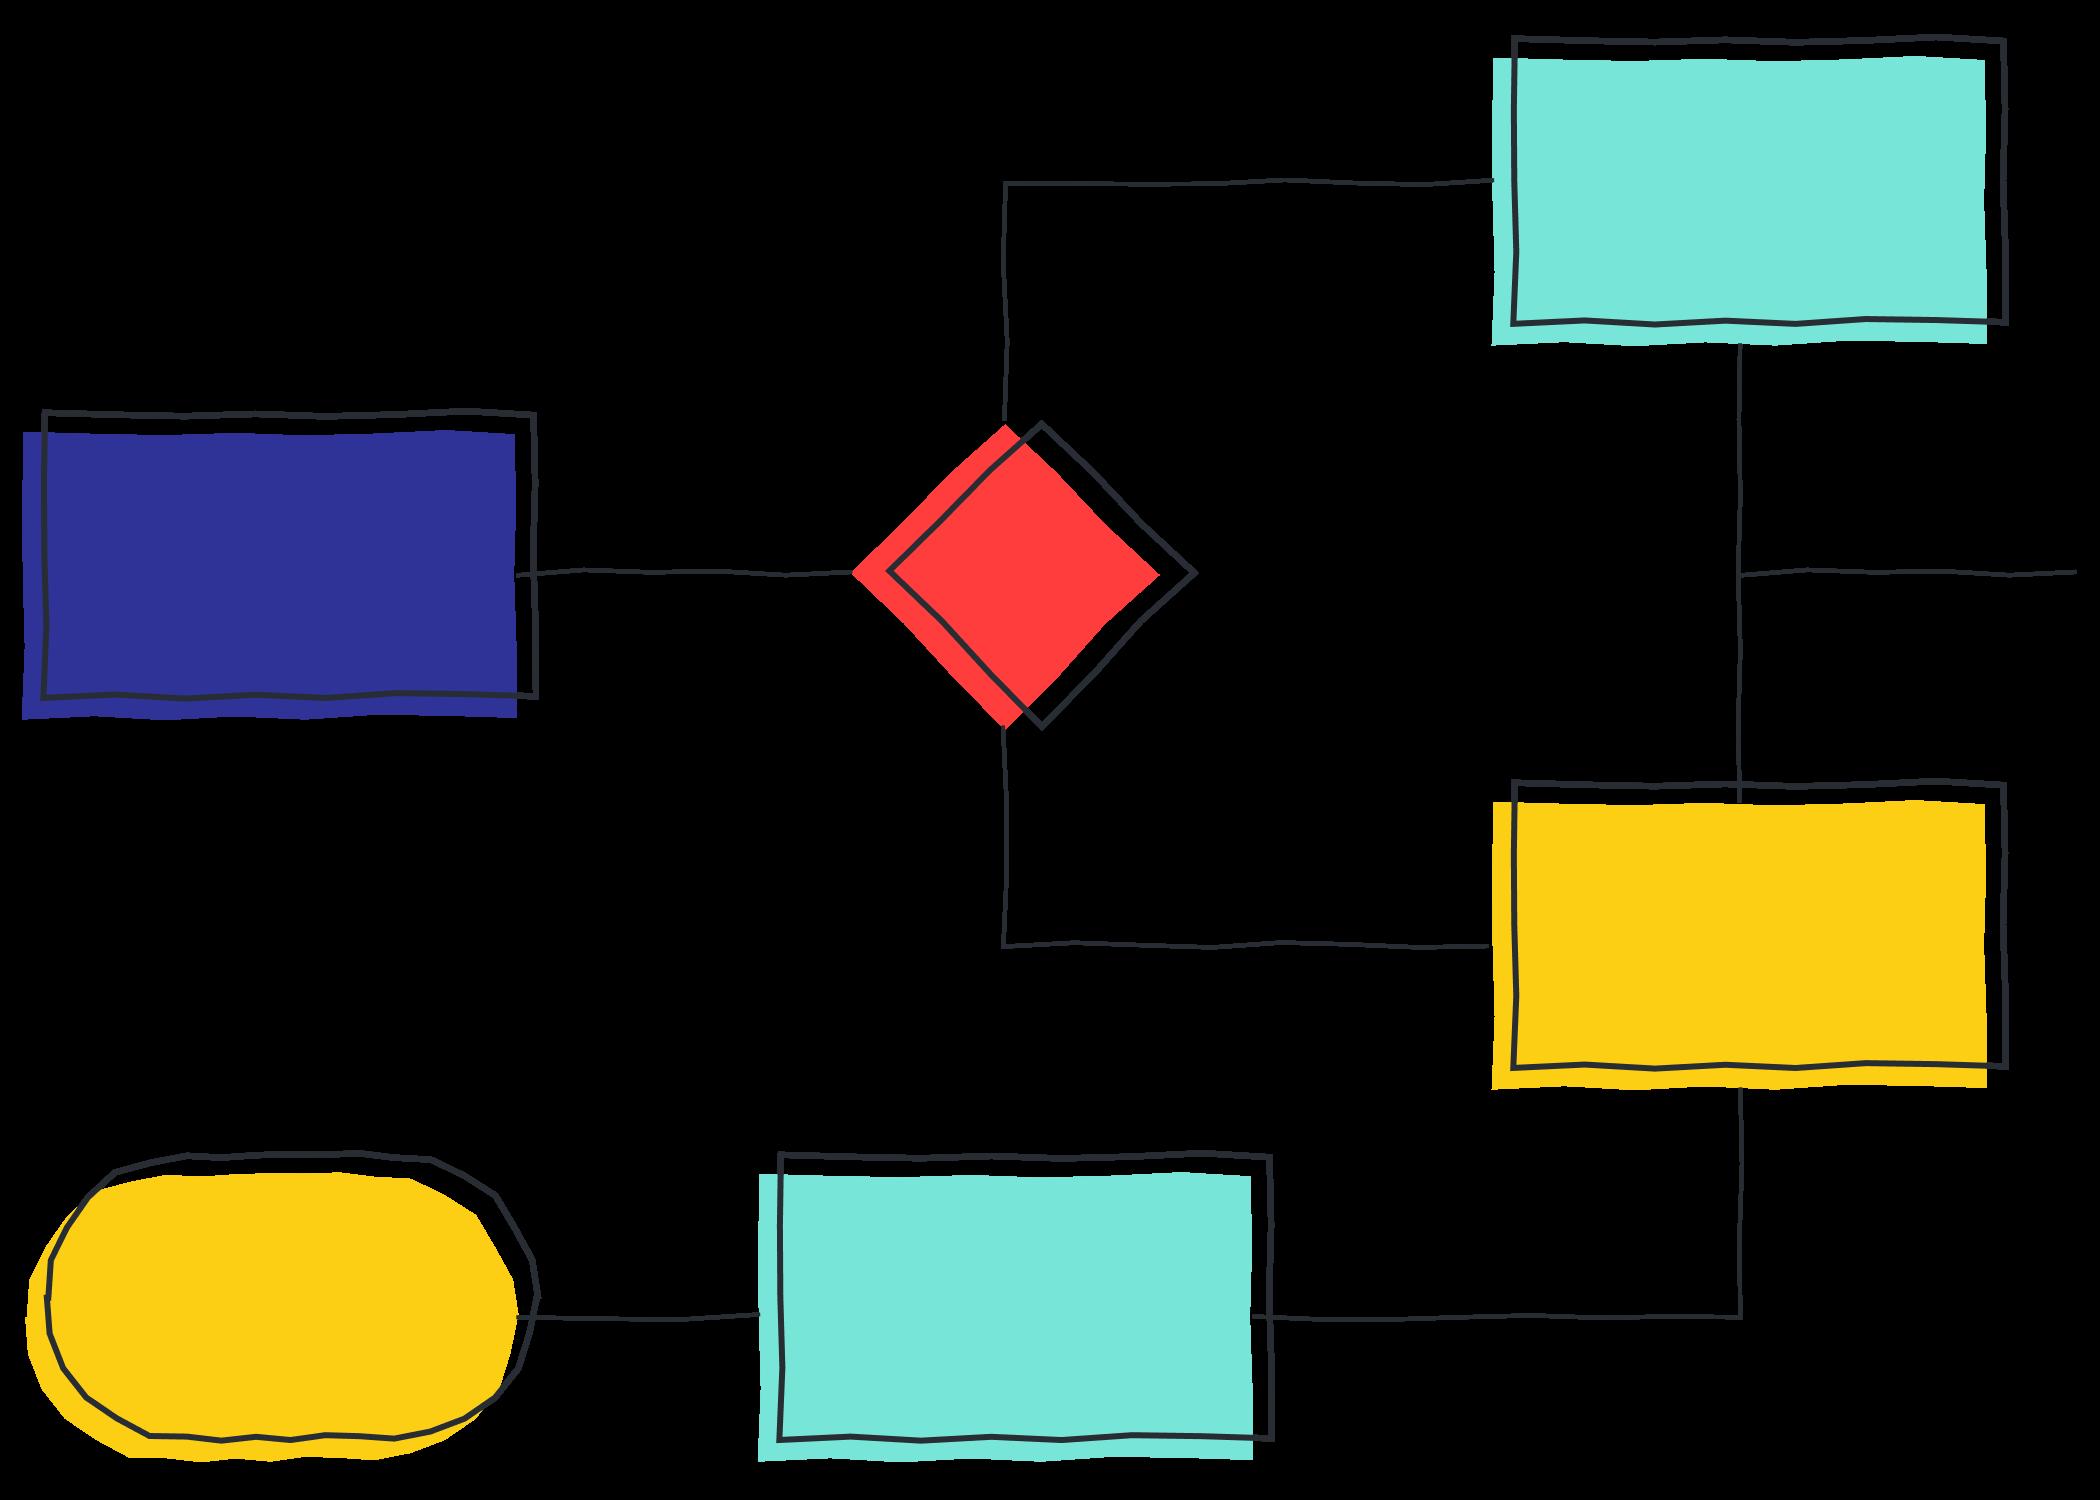 Lucidspark workflow diagram software